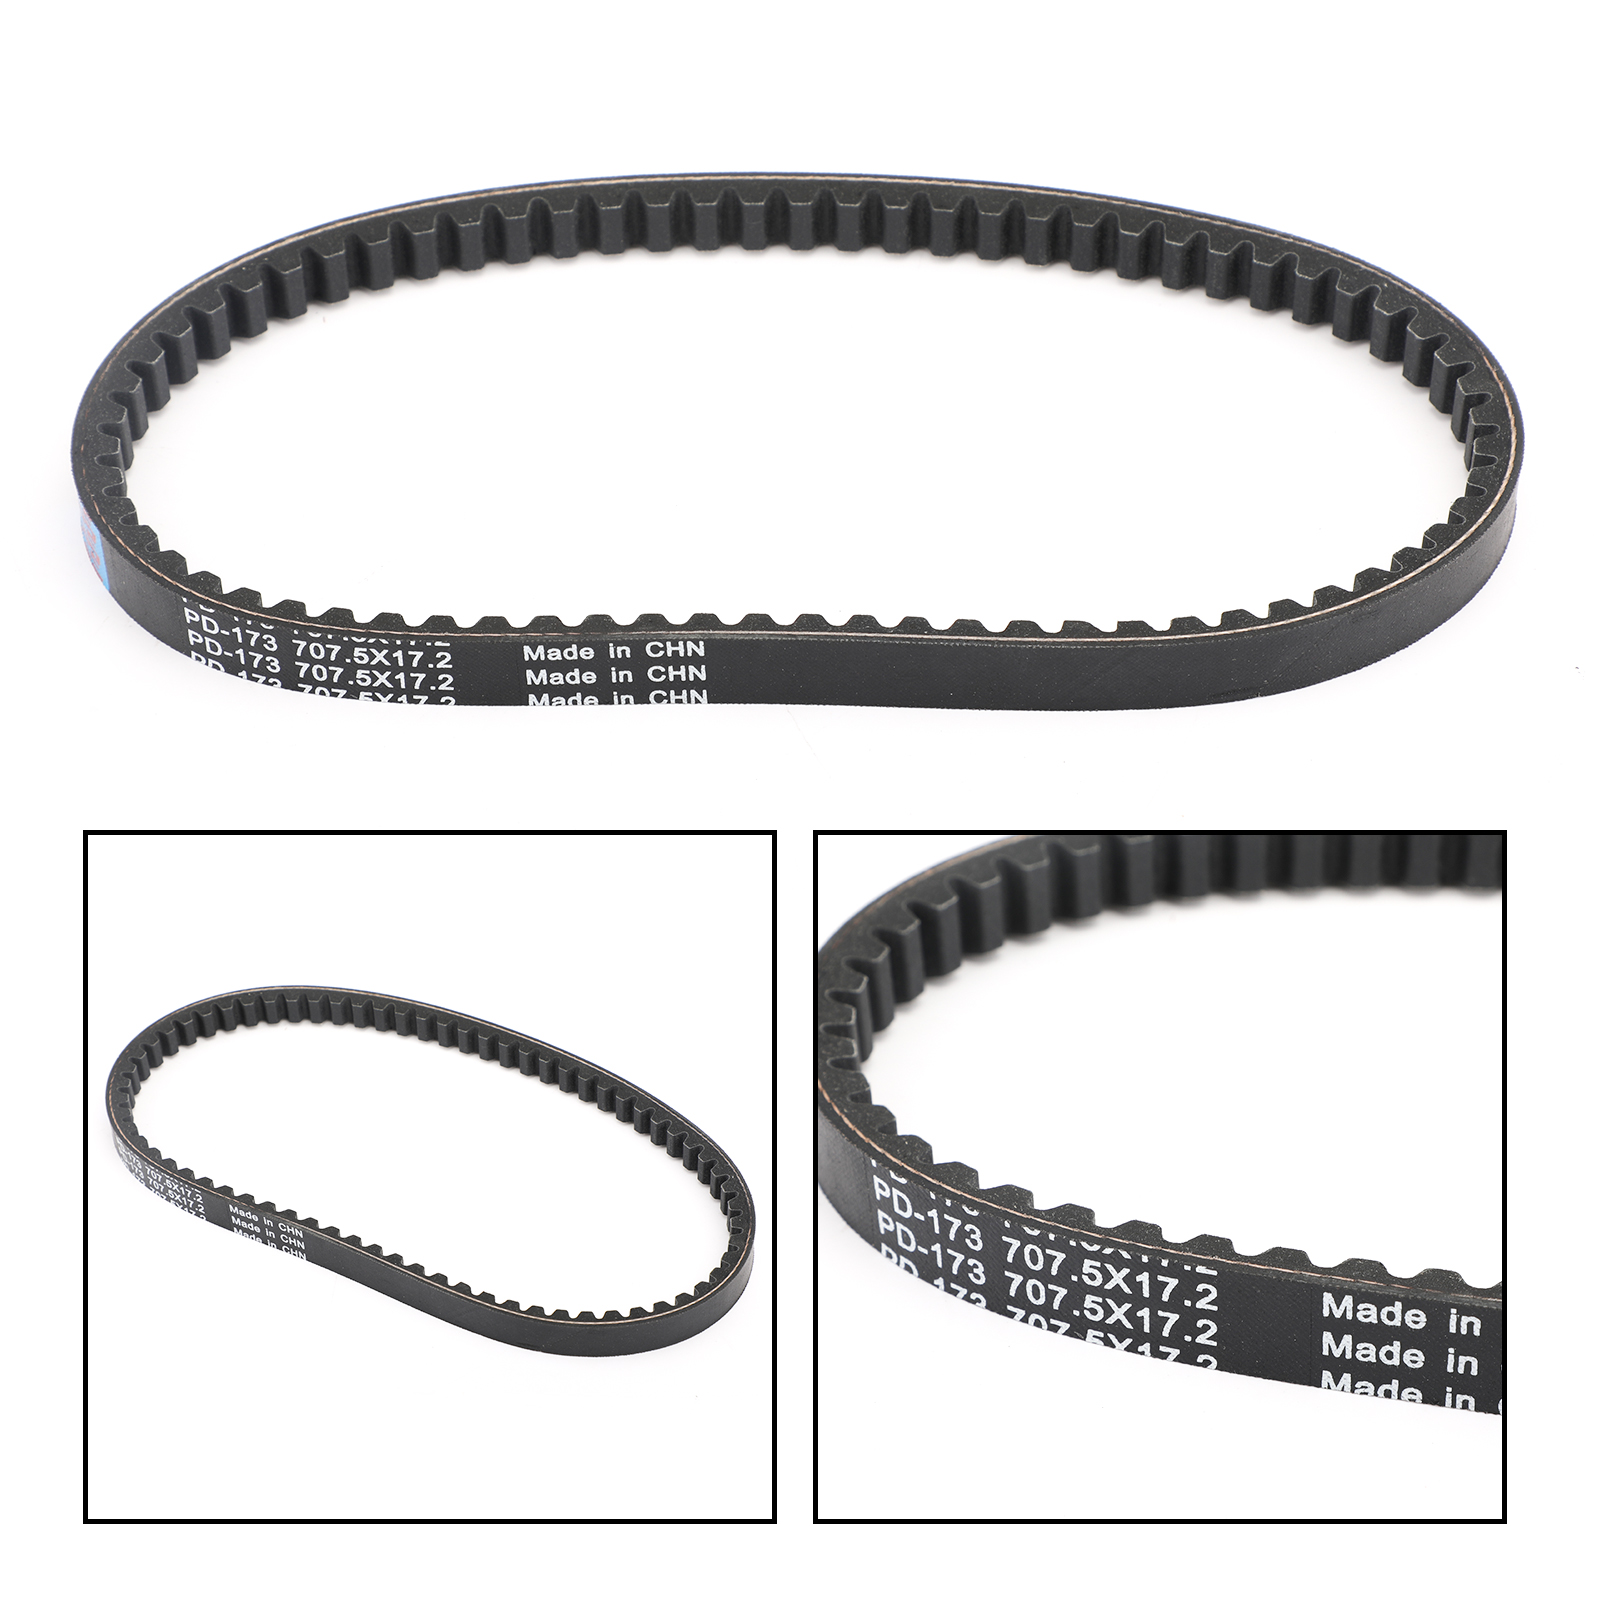 Drive belt for Polaris Sportsman90 2310018S-000 0453455 Predator50 Outlaw50 90